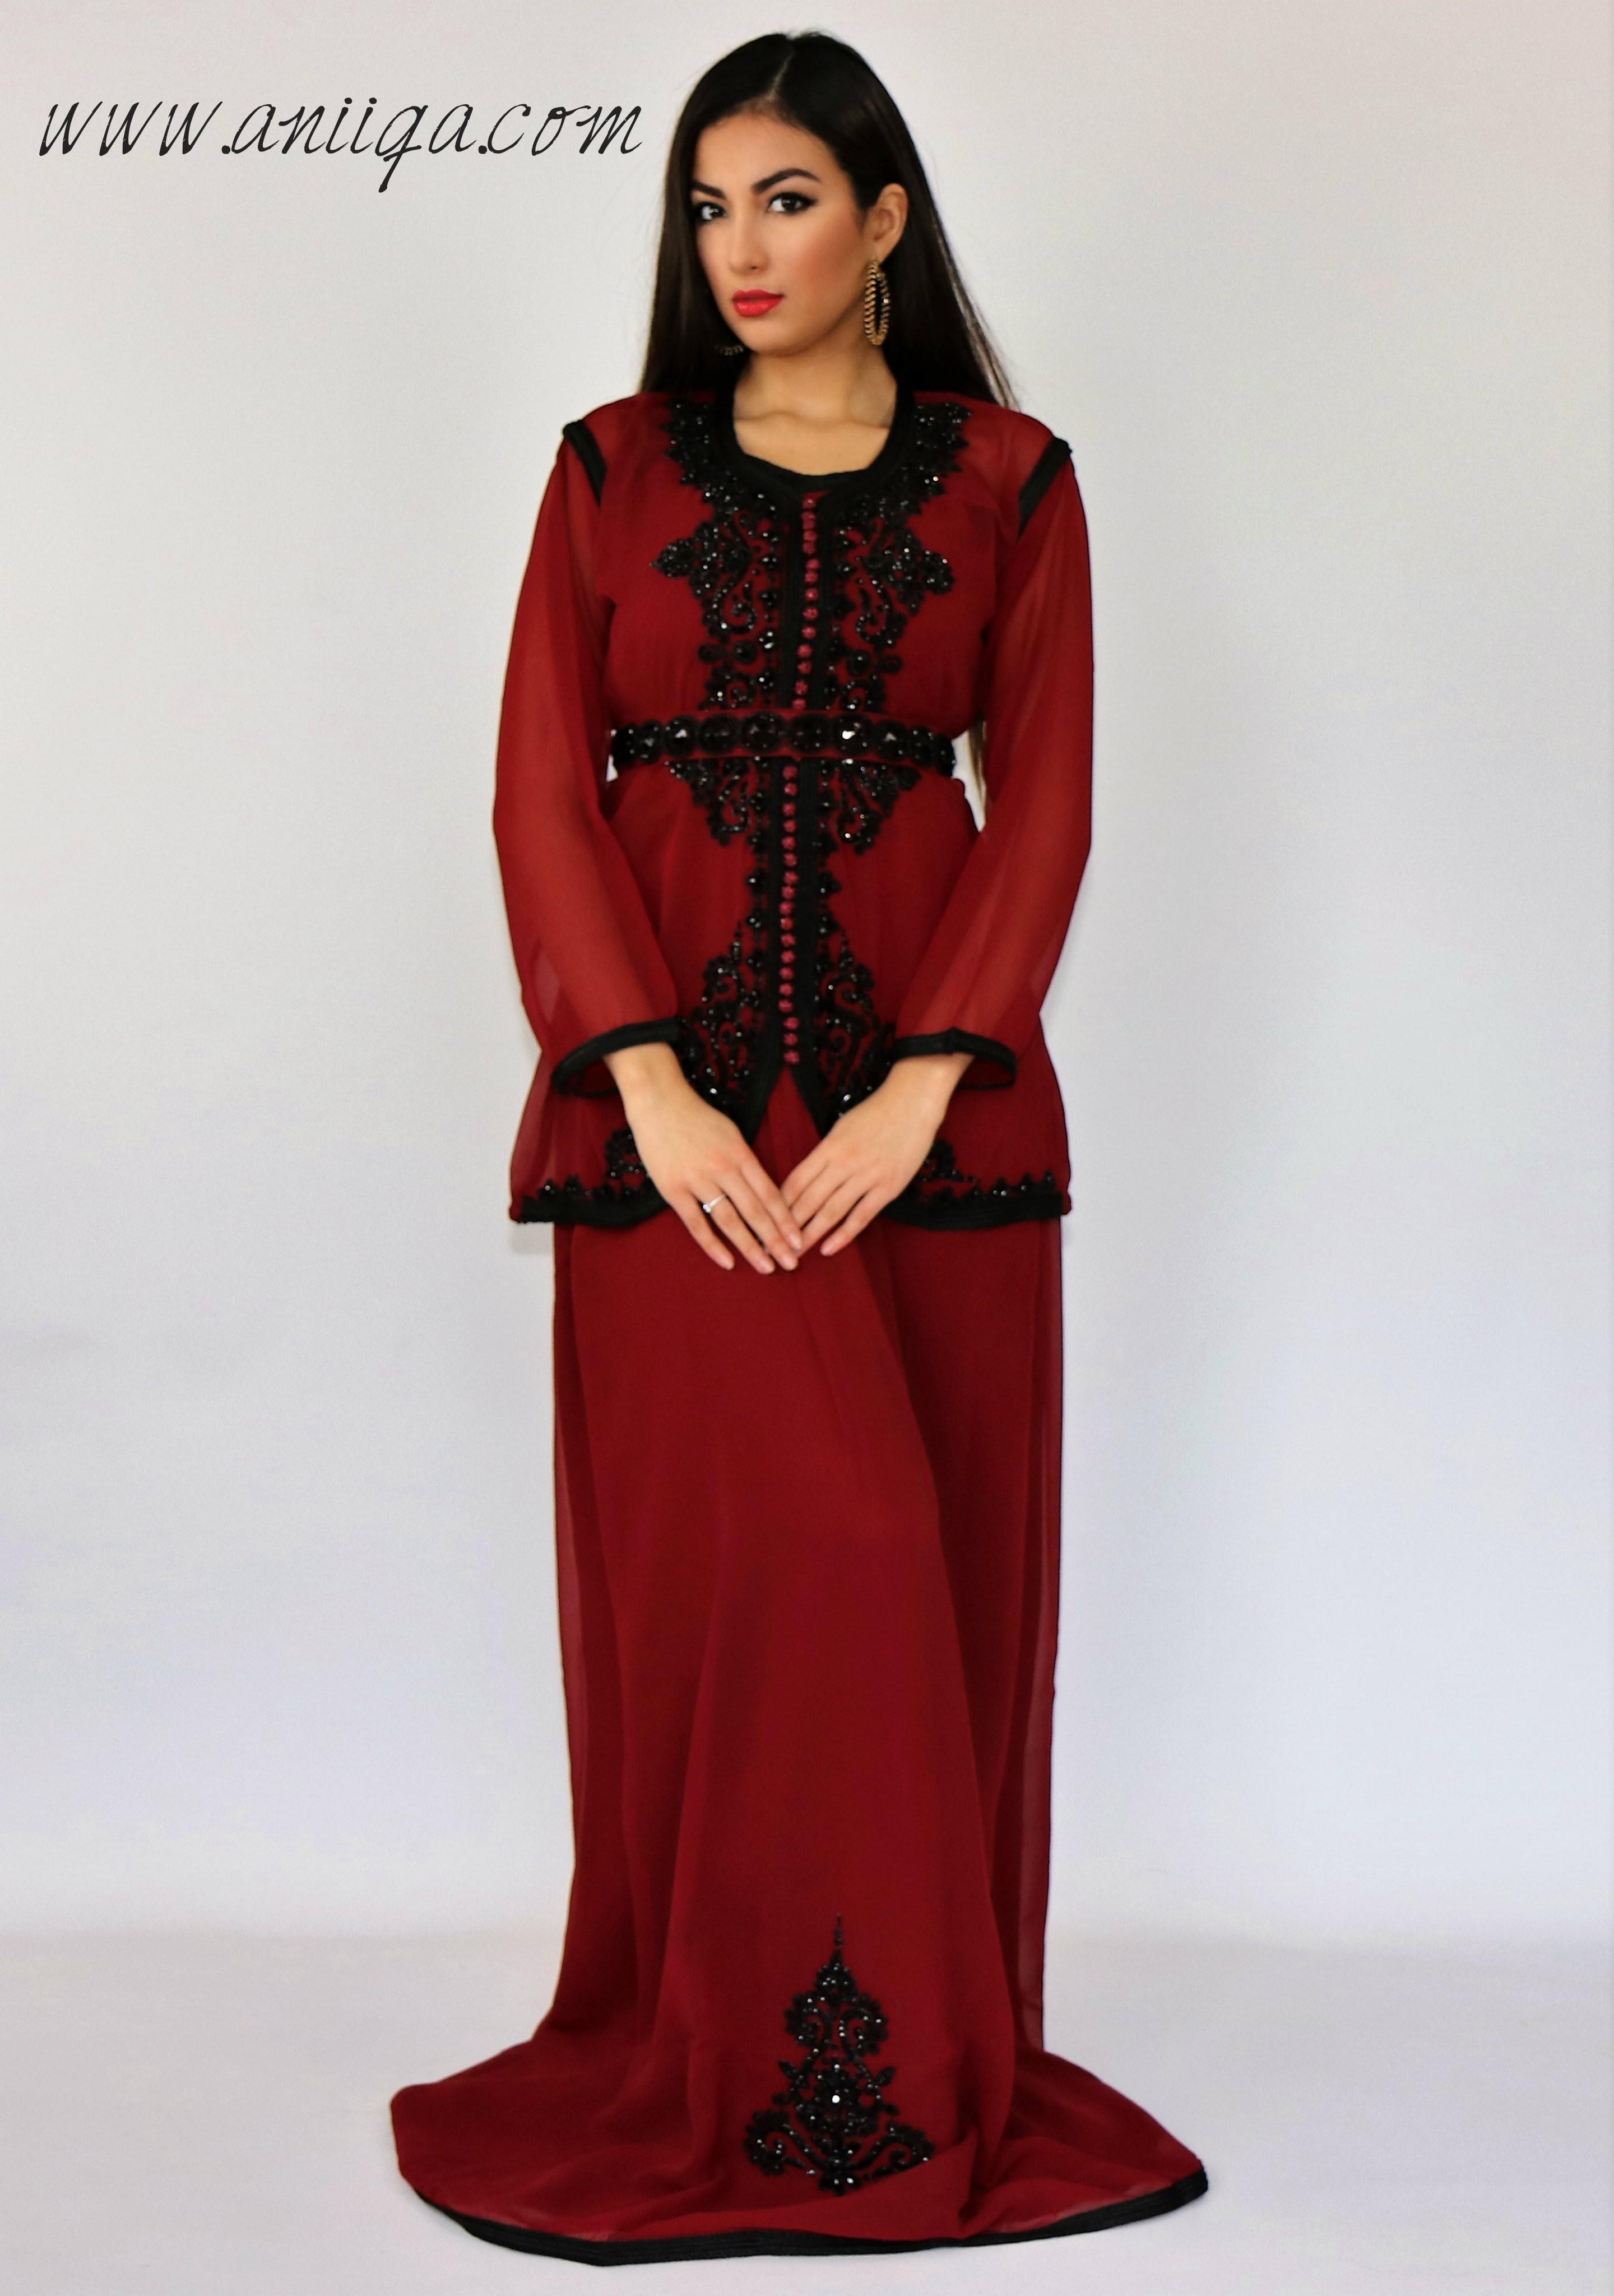 Robe de soiree orientale grande taille pas cher